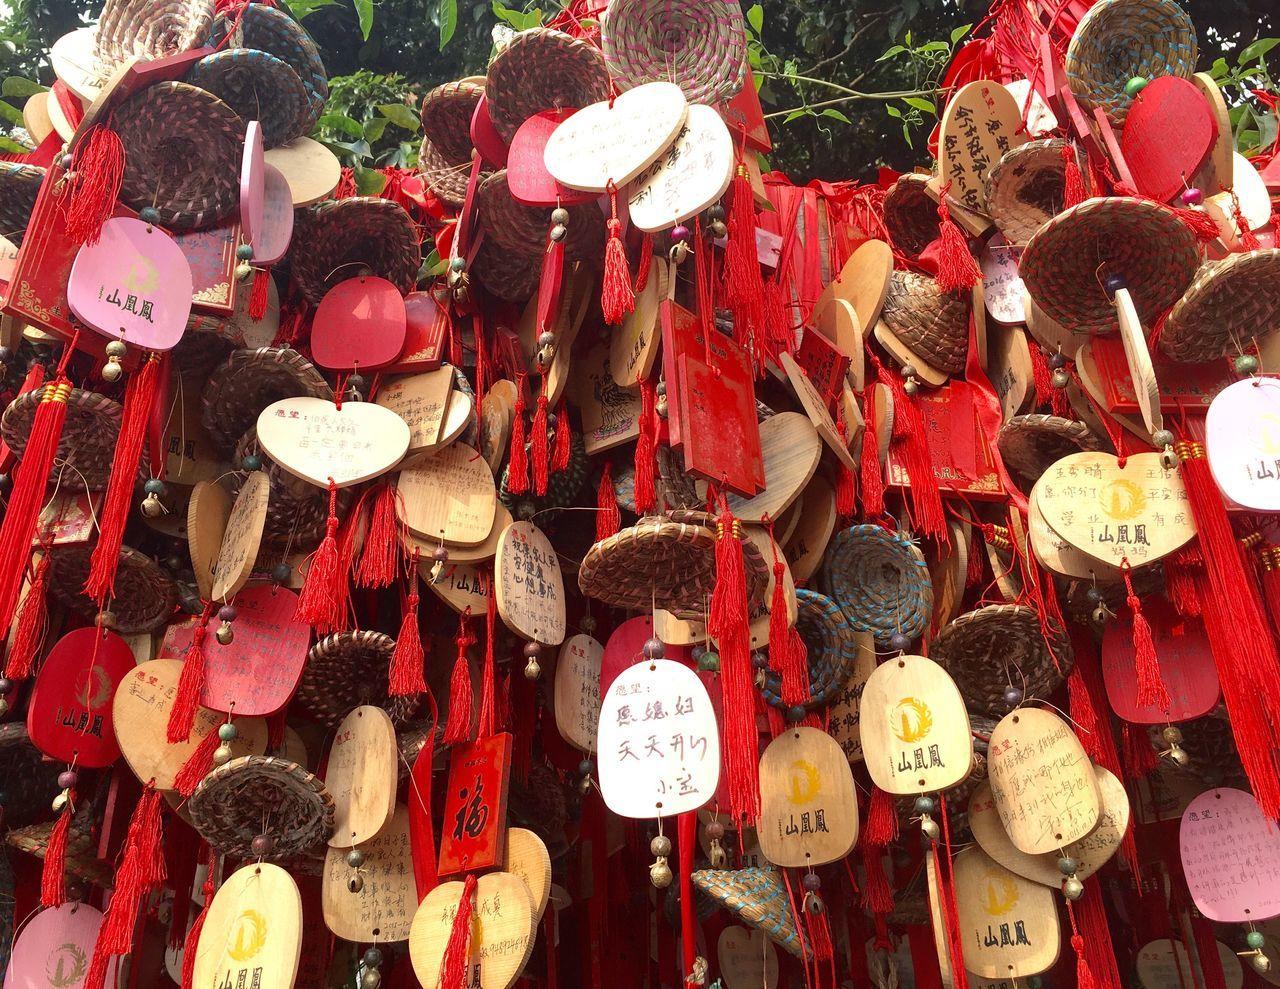 Chinese Wishing Tree at Phoenix Mountain in Baoan - Shenzhen, China Wishing Tree Traditional Culture China Chinese Wishes Wish Tree Shenzhen Buddhism Buddhist Temple Mountain Tree BaoAn Temple Hanging Phoenix Mountain Traditional Chinese Chinese Culture Traditionally Chinese Chinese Style